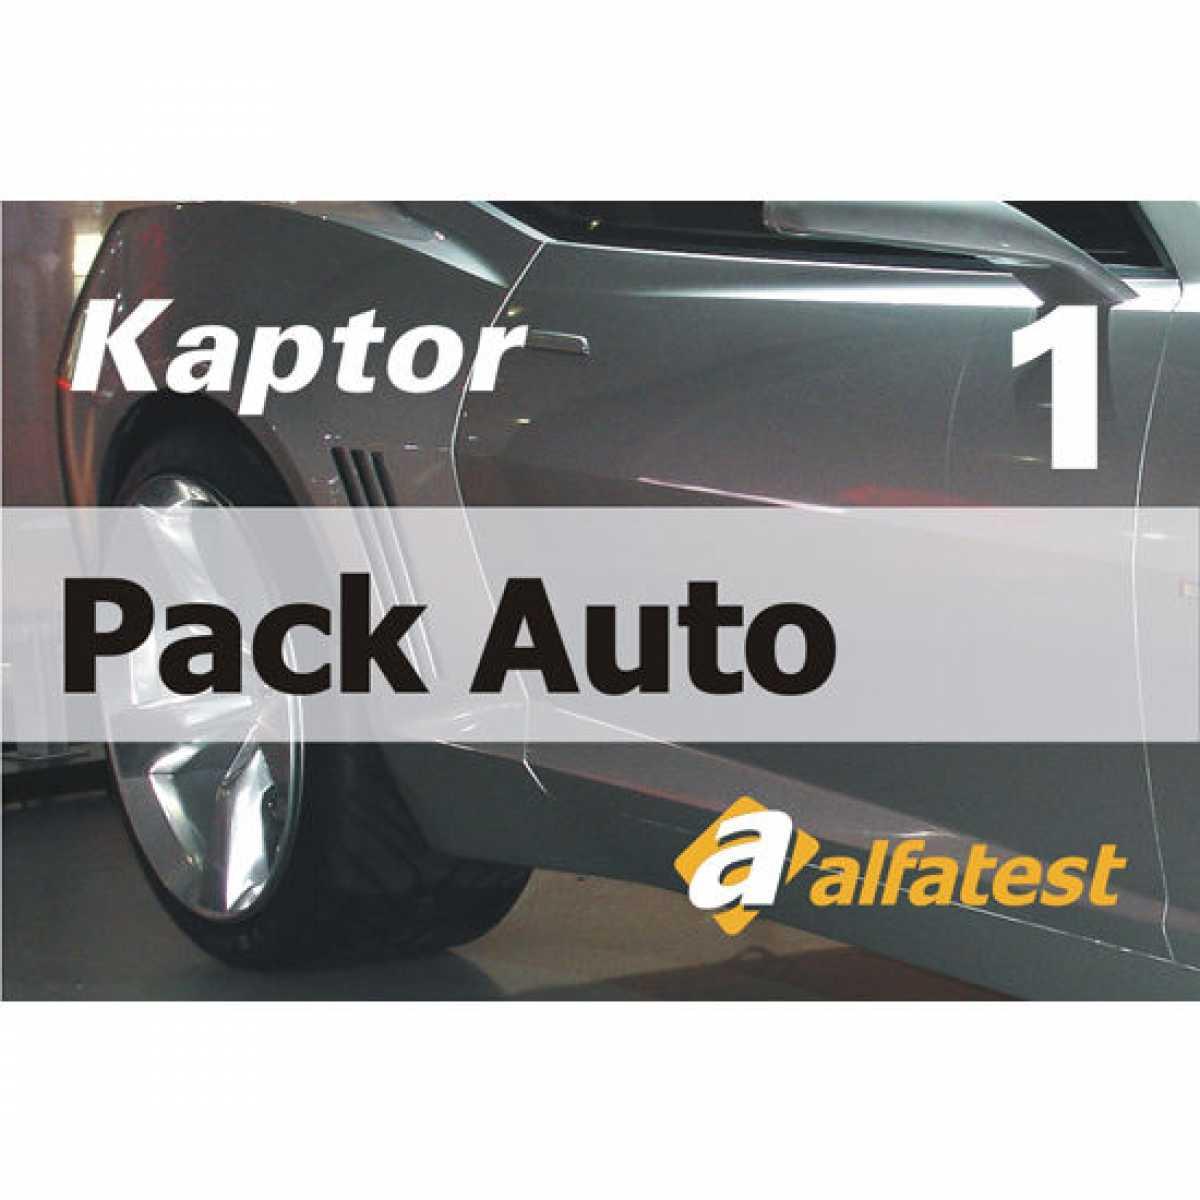 Cartao Liberacao Pack Auto 1 Alfatest